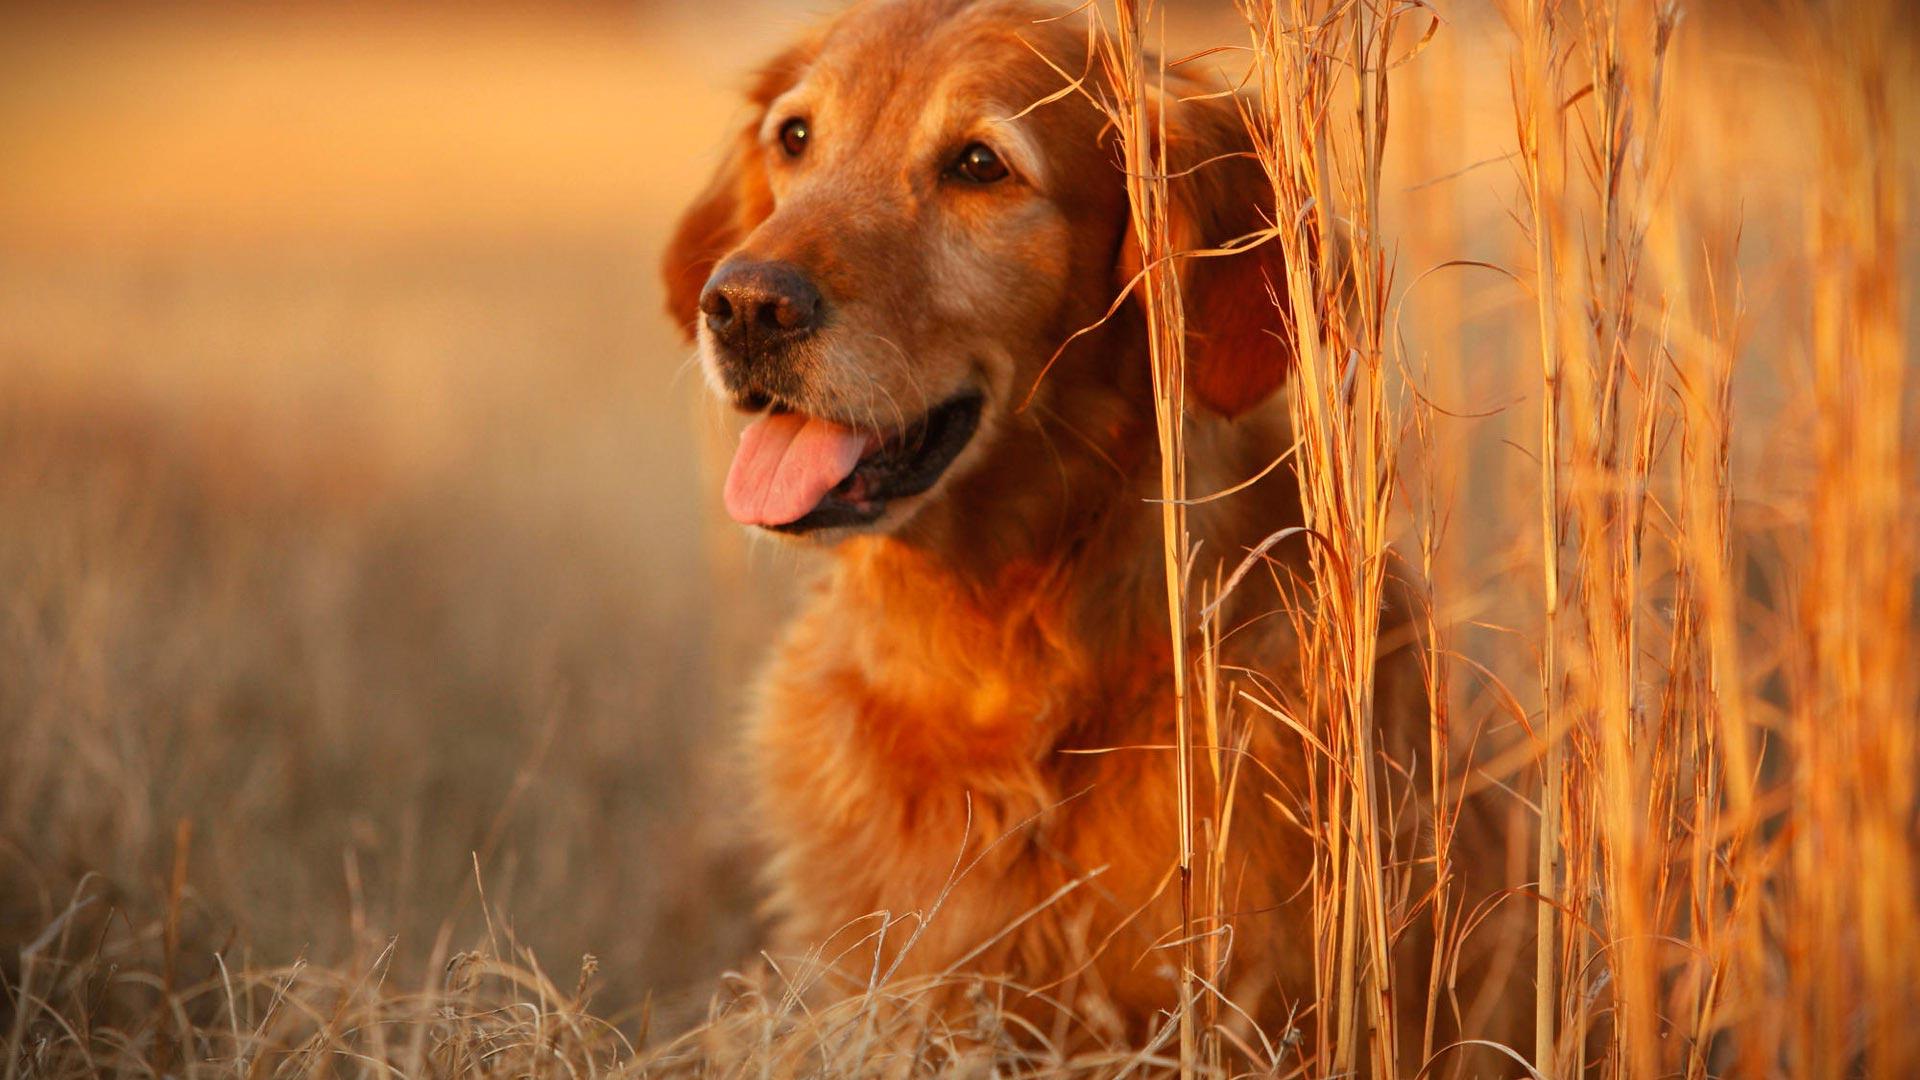 Beautiful Dogs Wallpaper HD - WallpaperSafari